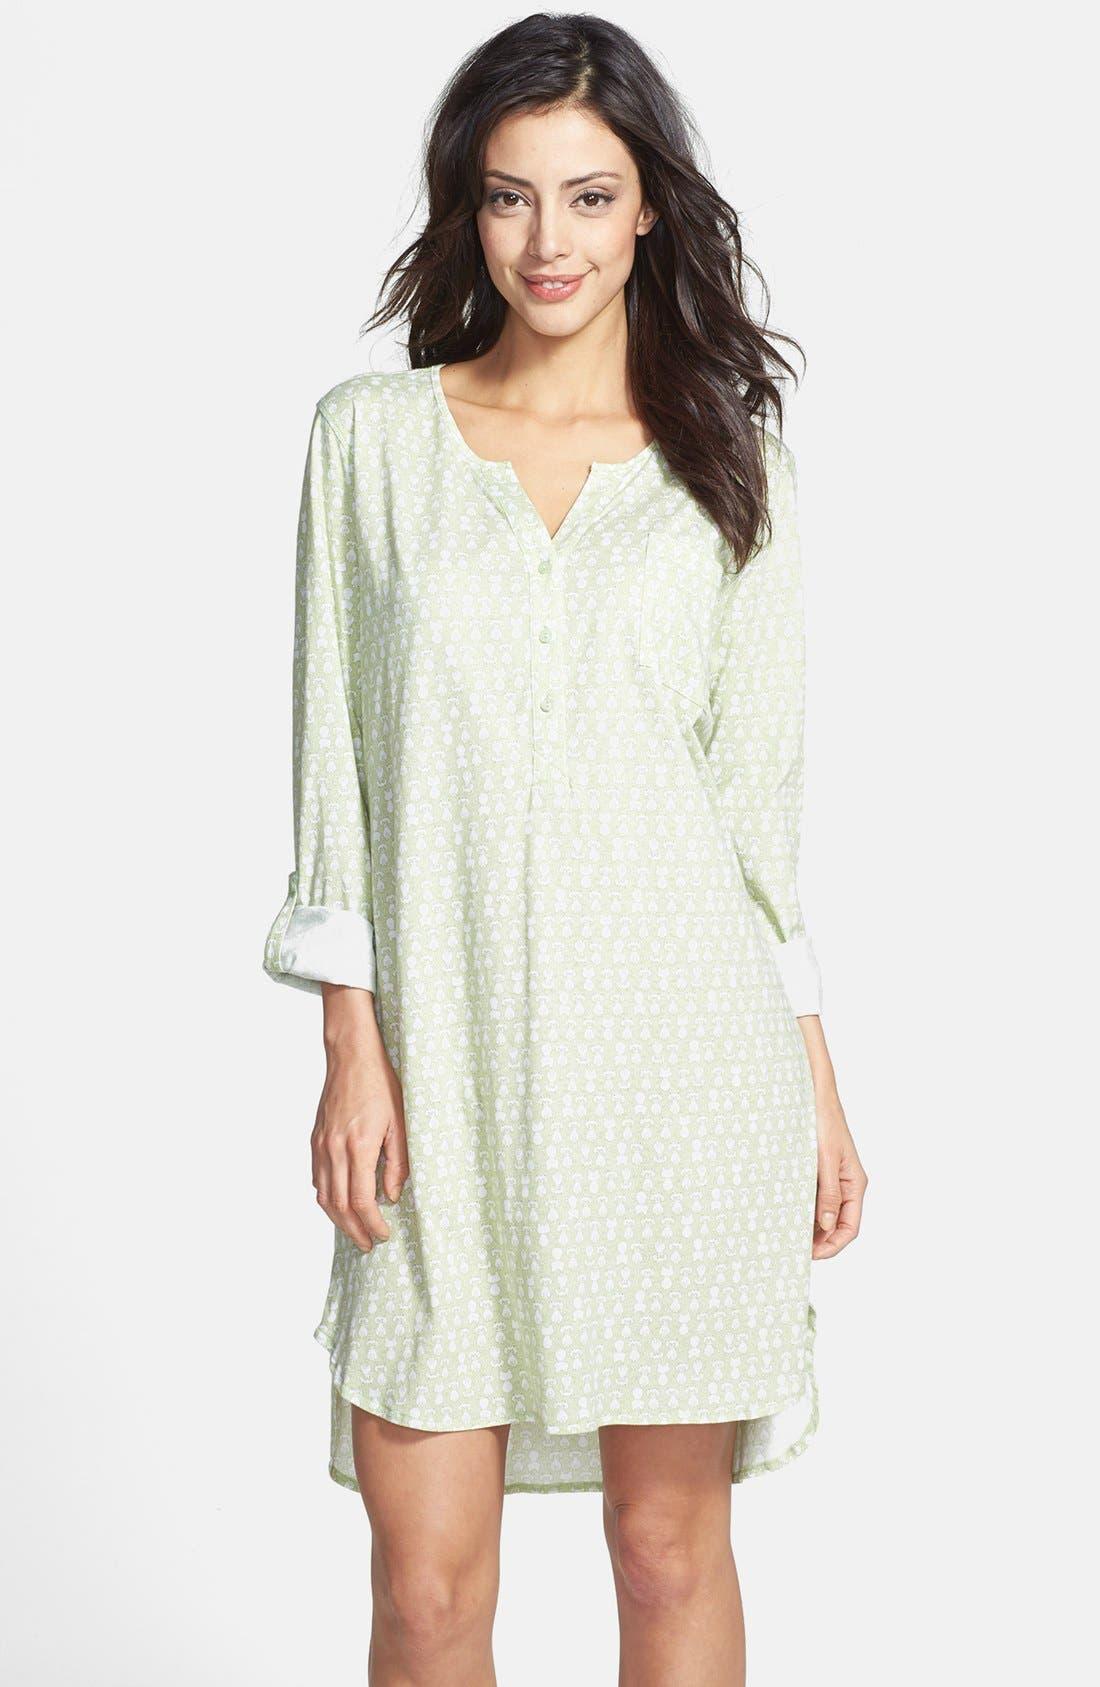 Alternate Image 1 Selected - Carole Hochman Designs 'Radiant Dots' Sleep Shirt